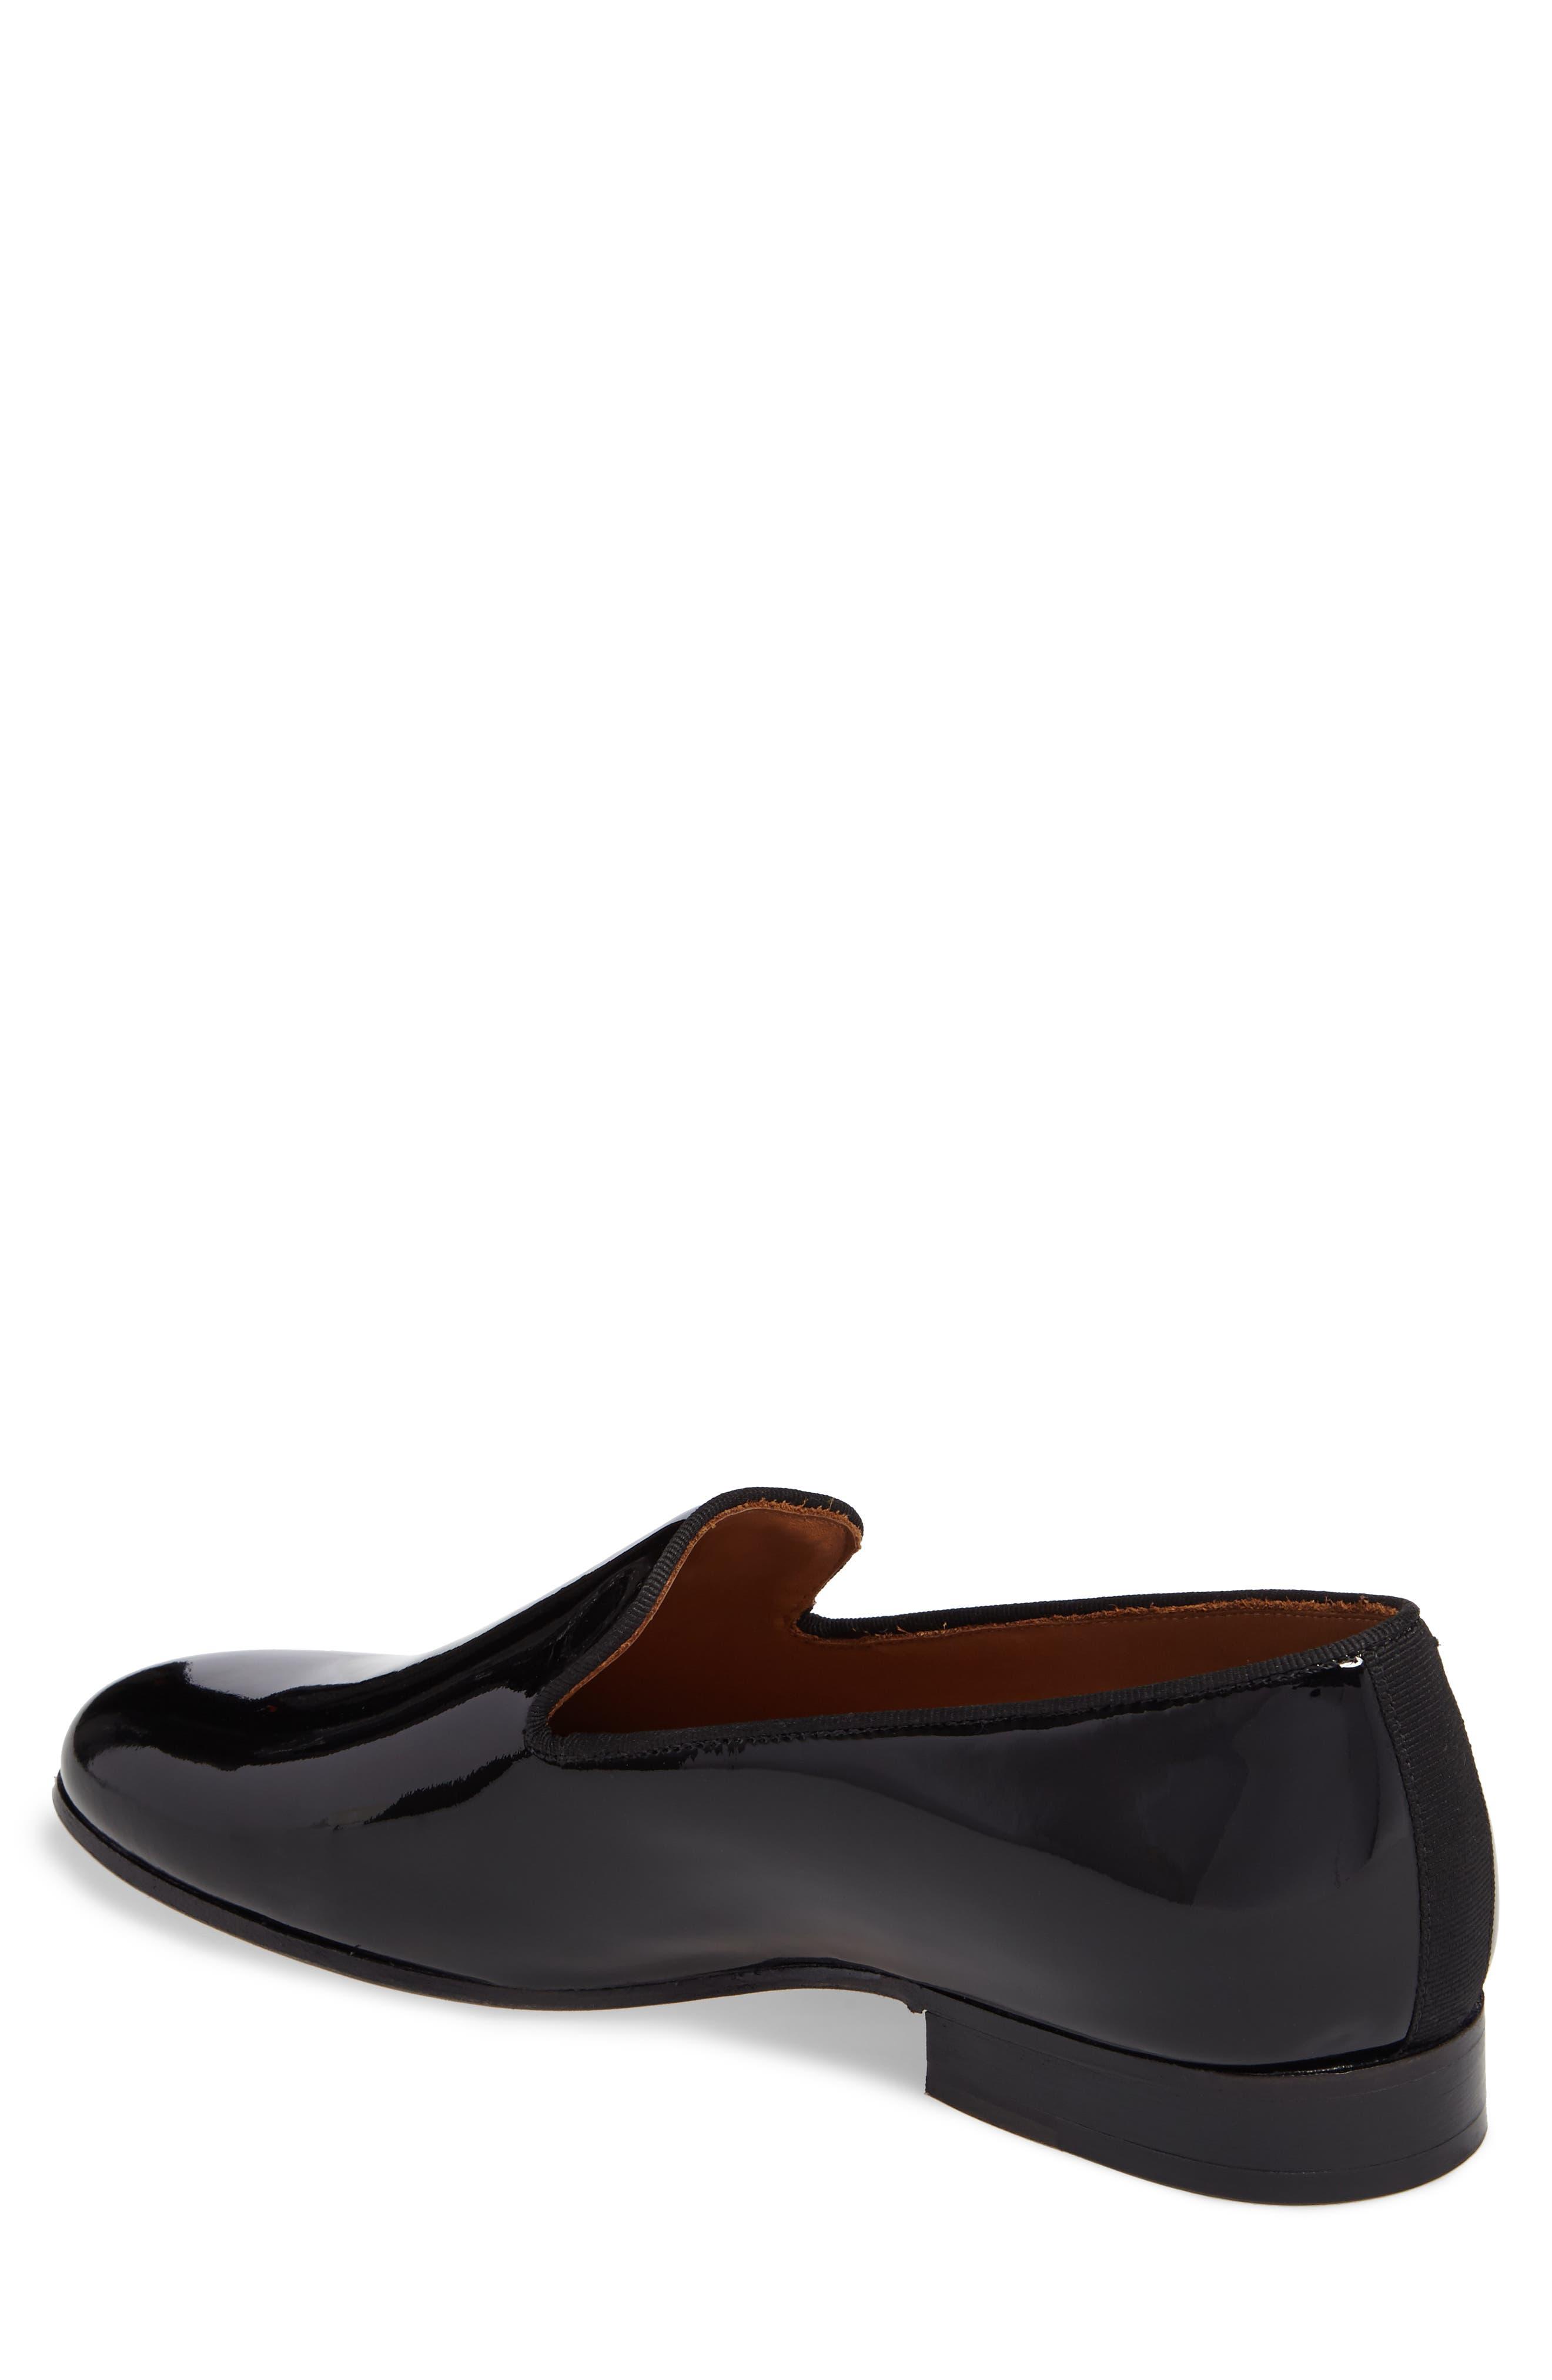 Bravi Loafer,                             Alternate thumbnail 2, color,                             Black Patent Leather